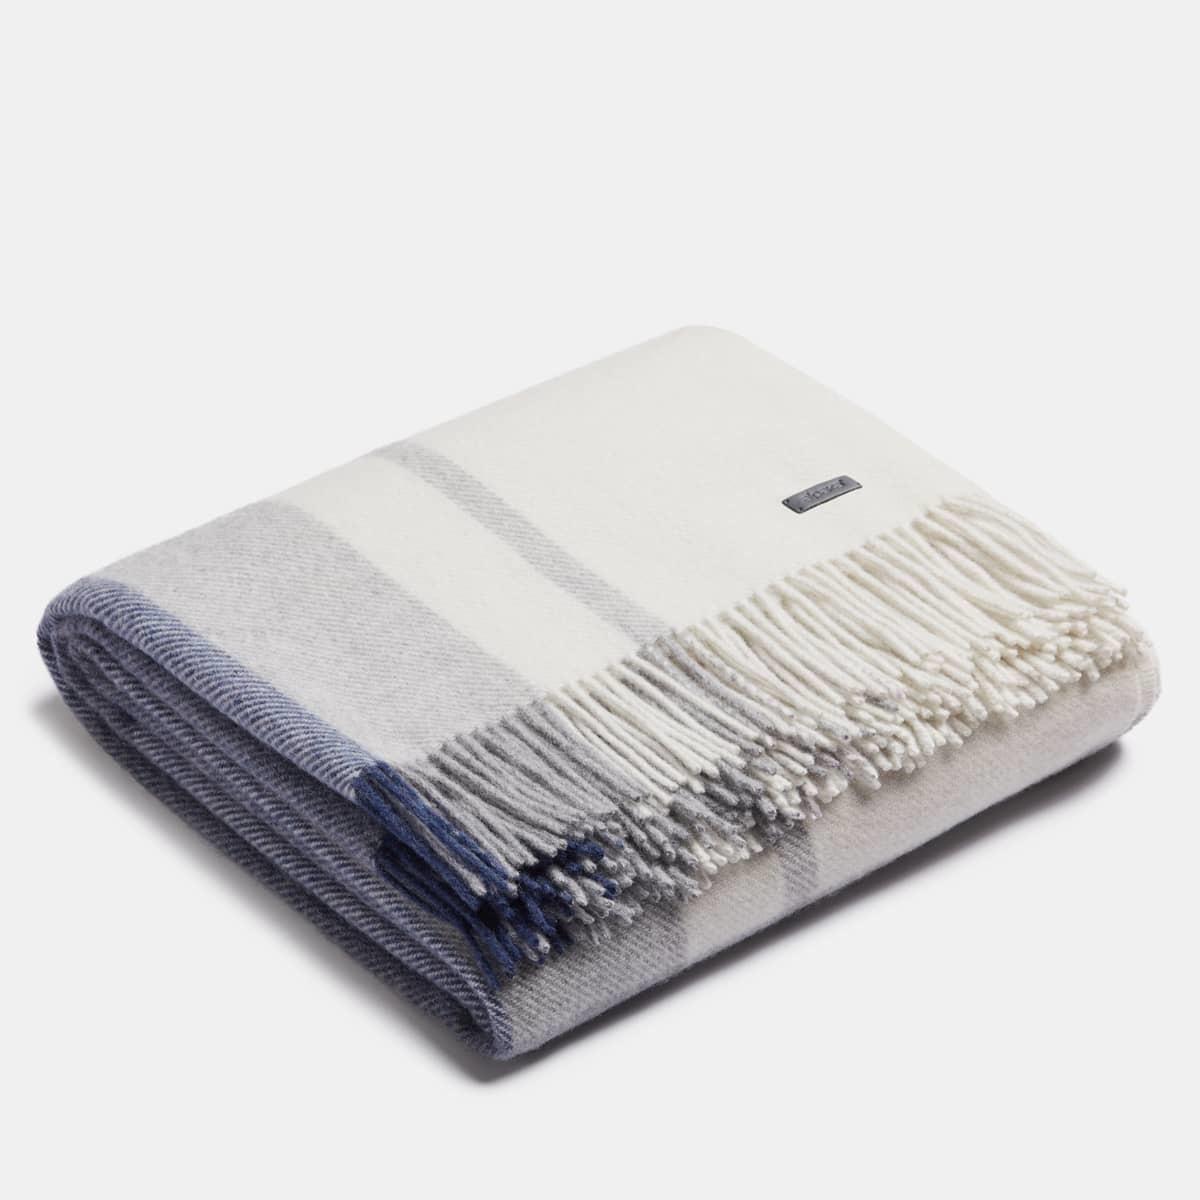 ALPAKA - Classic Check - Plaid en laine d'alpaga - Bleu / Argent - 150 x 200